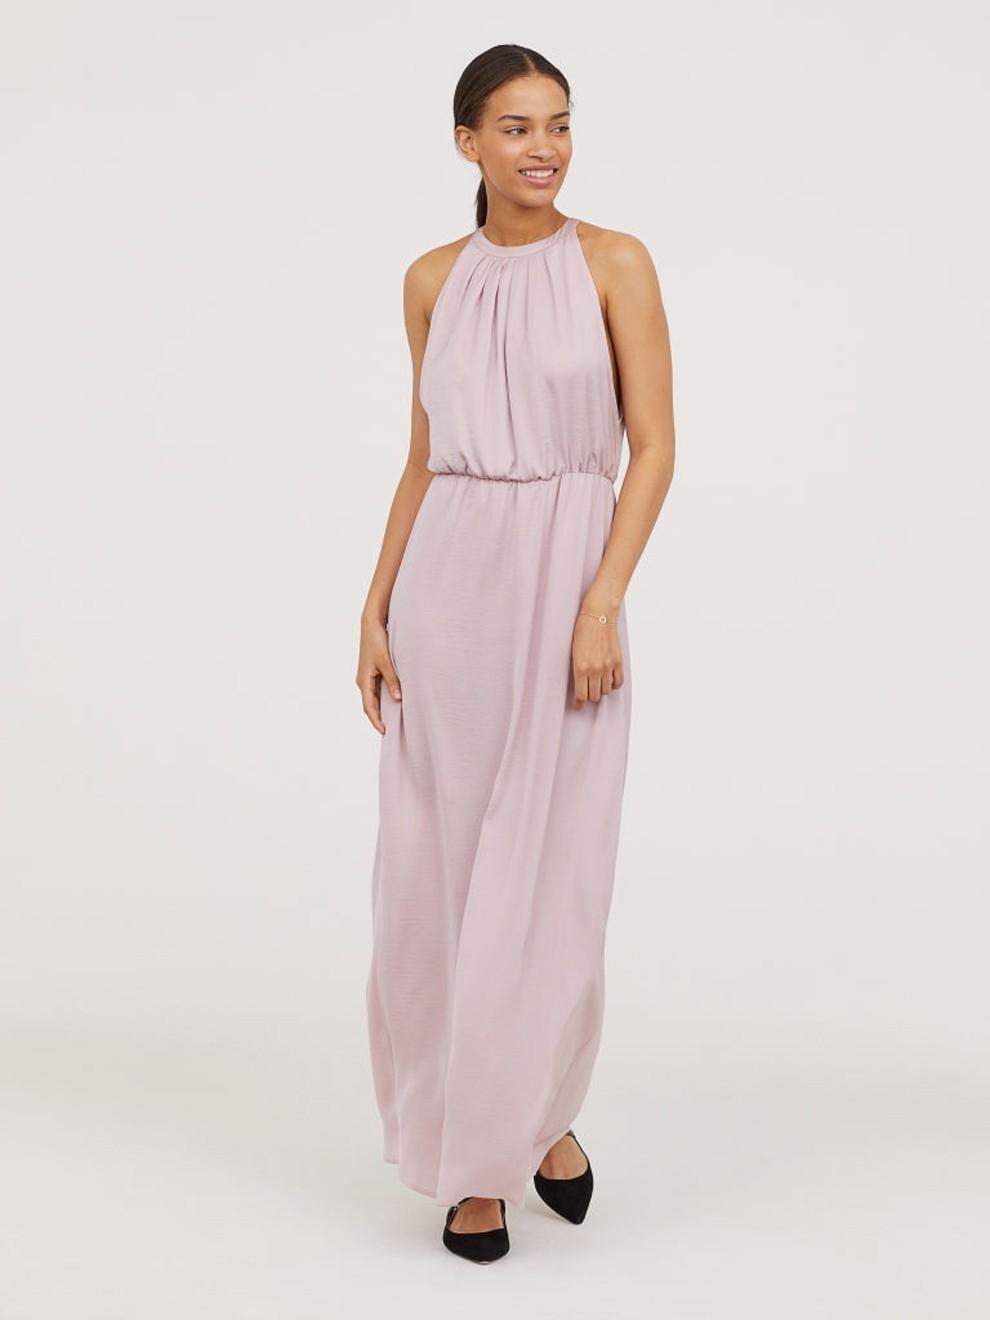 Vestido rosa cuarzo para triunfar en 2019 de H&M por 39'99 euros